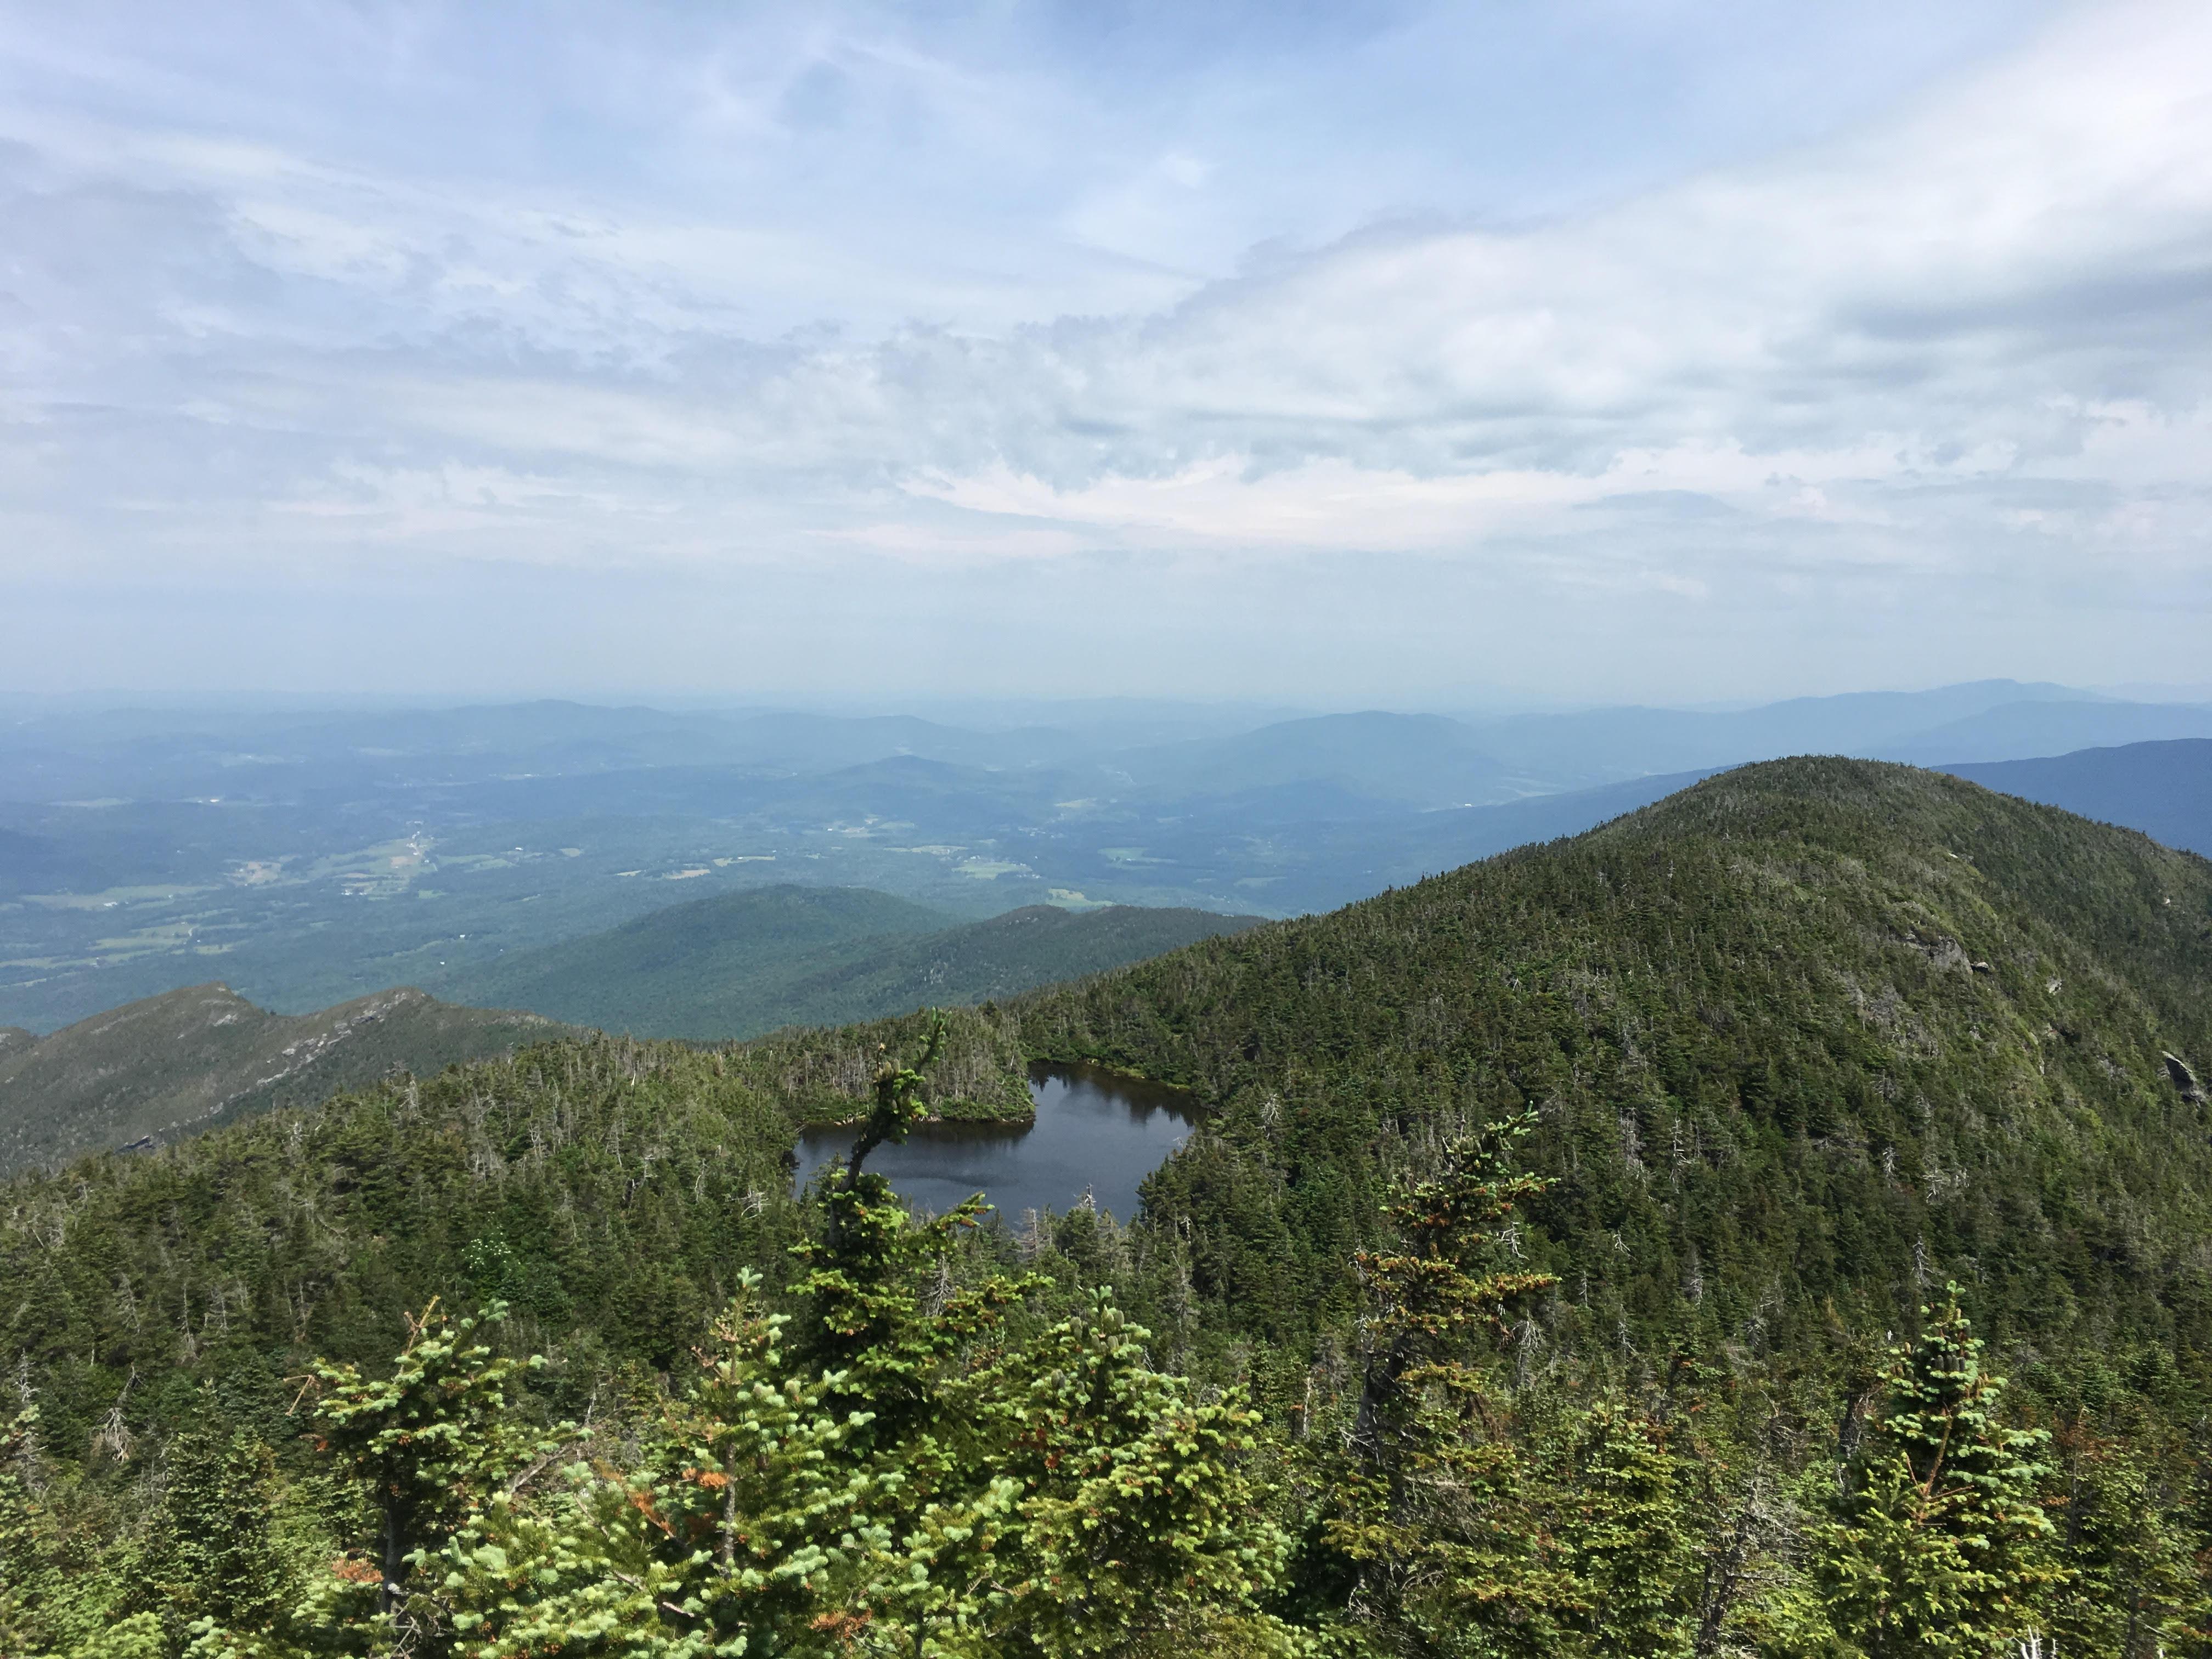 Training Journal – Bouldering, Trail Run, Hike: 7/1/19 – 7/7/19